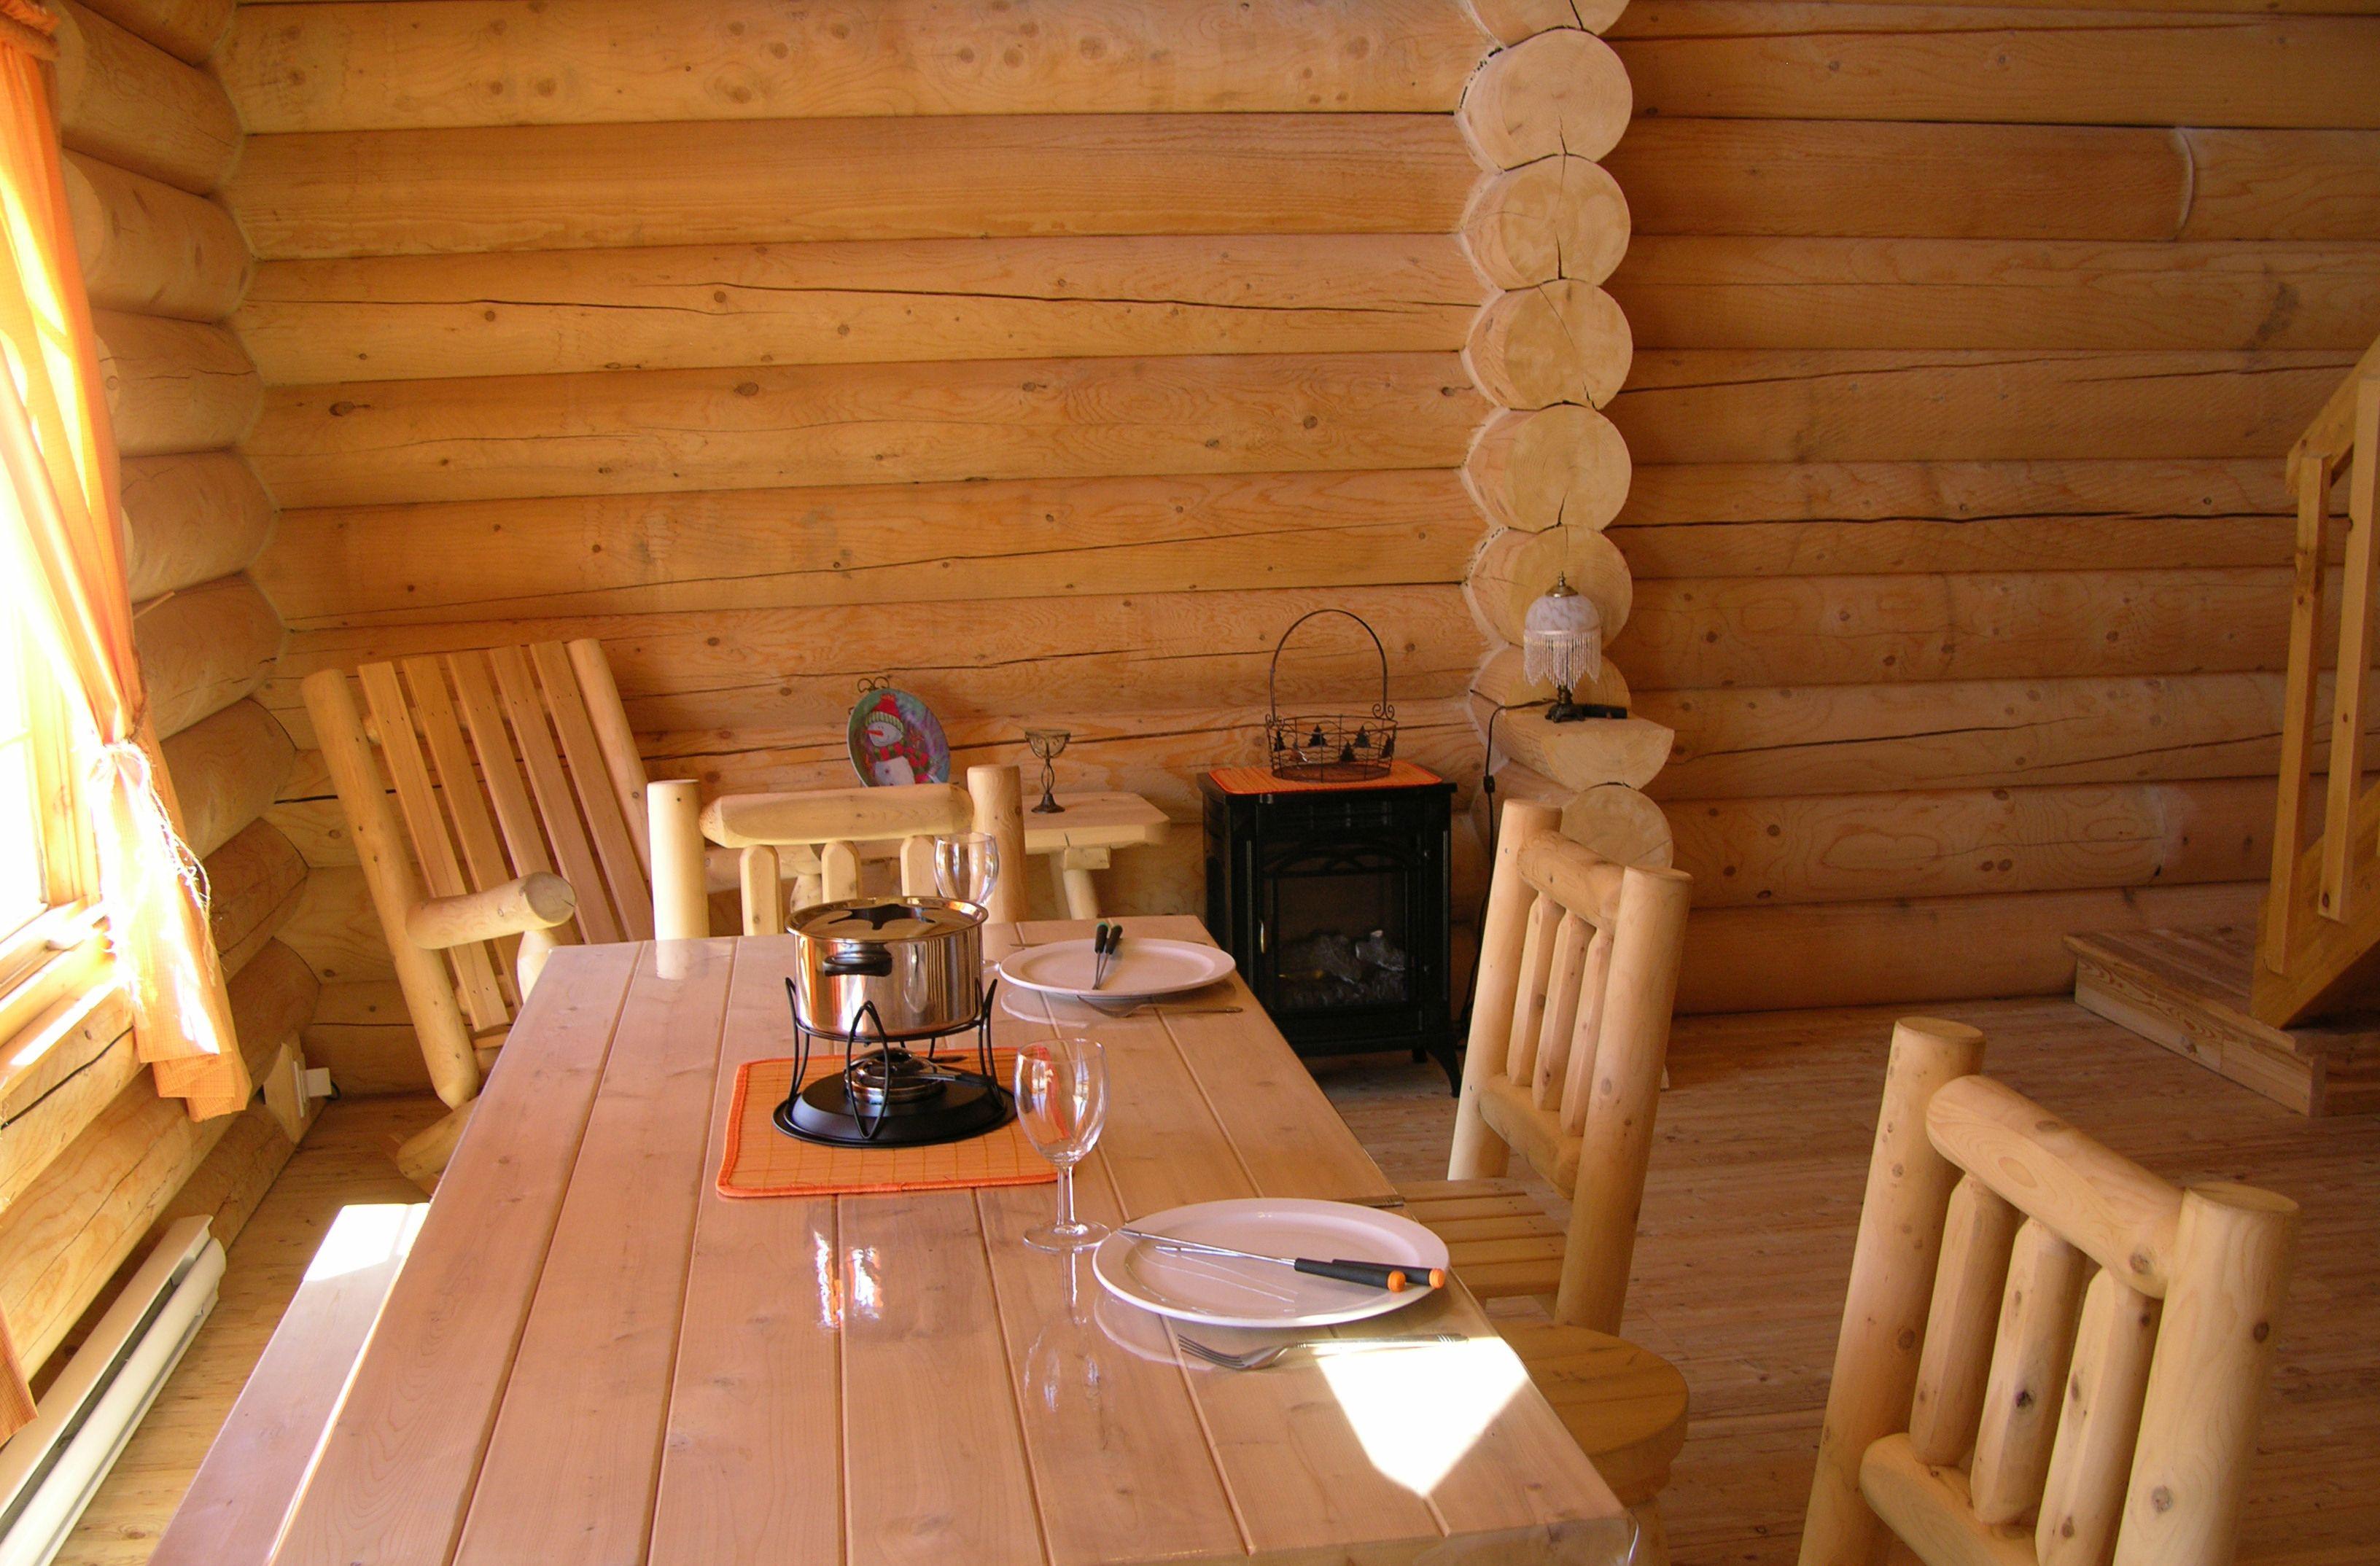 chalet-monts-valin-bois-rond-salle-à-manger